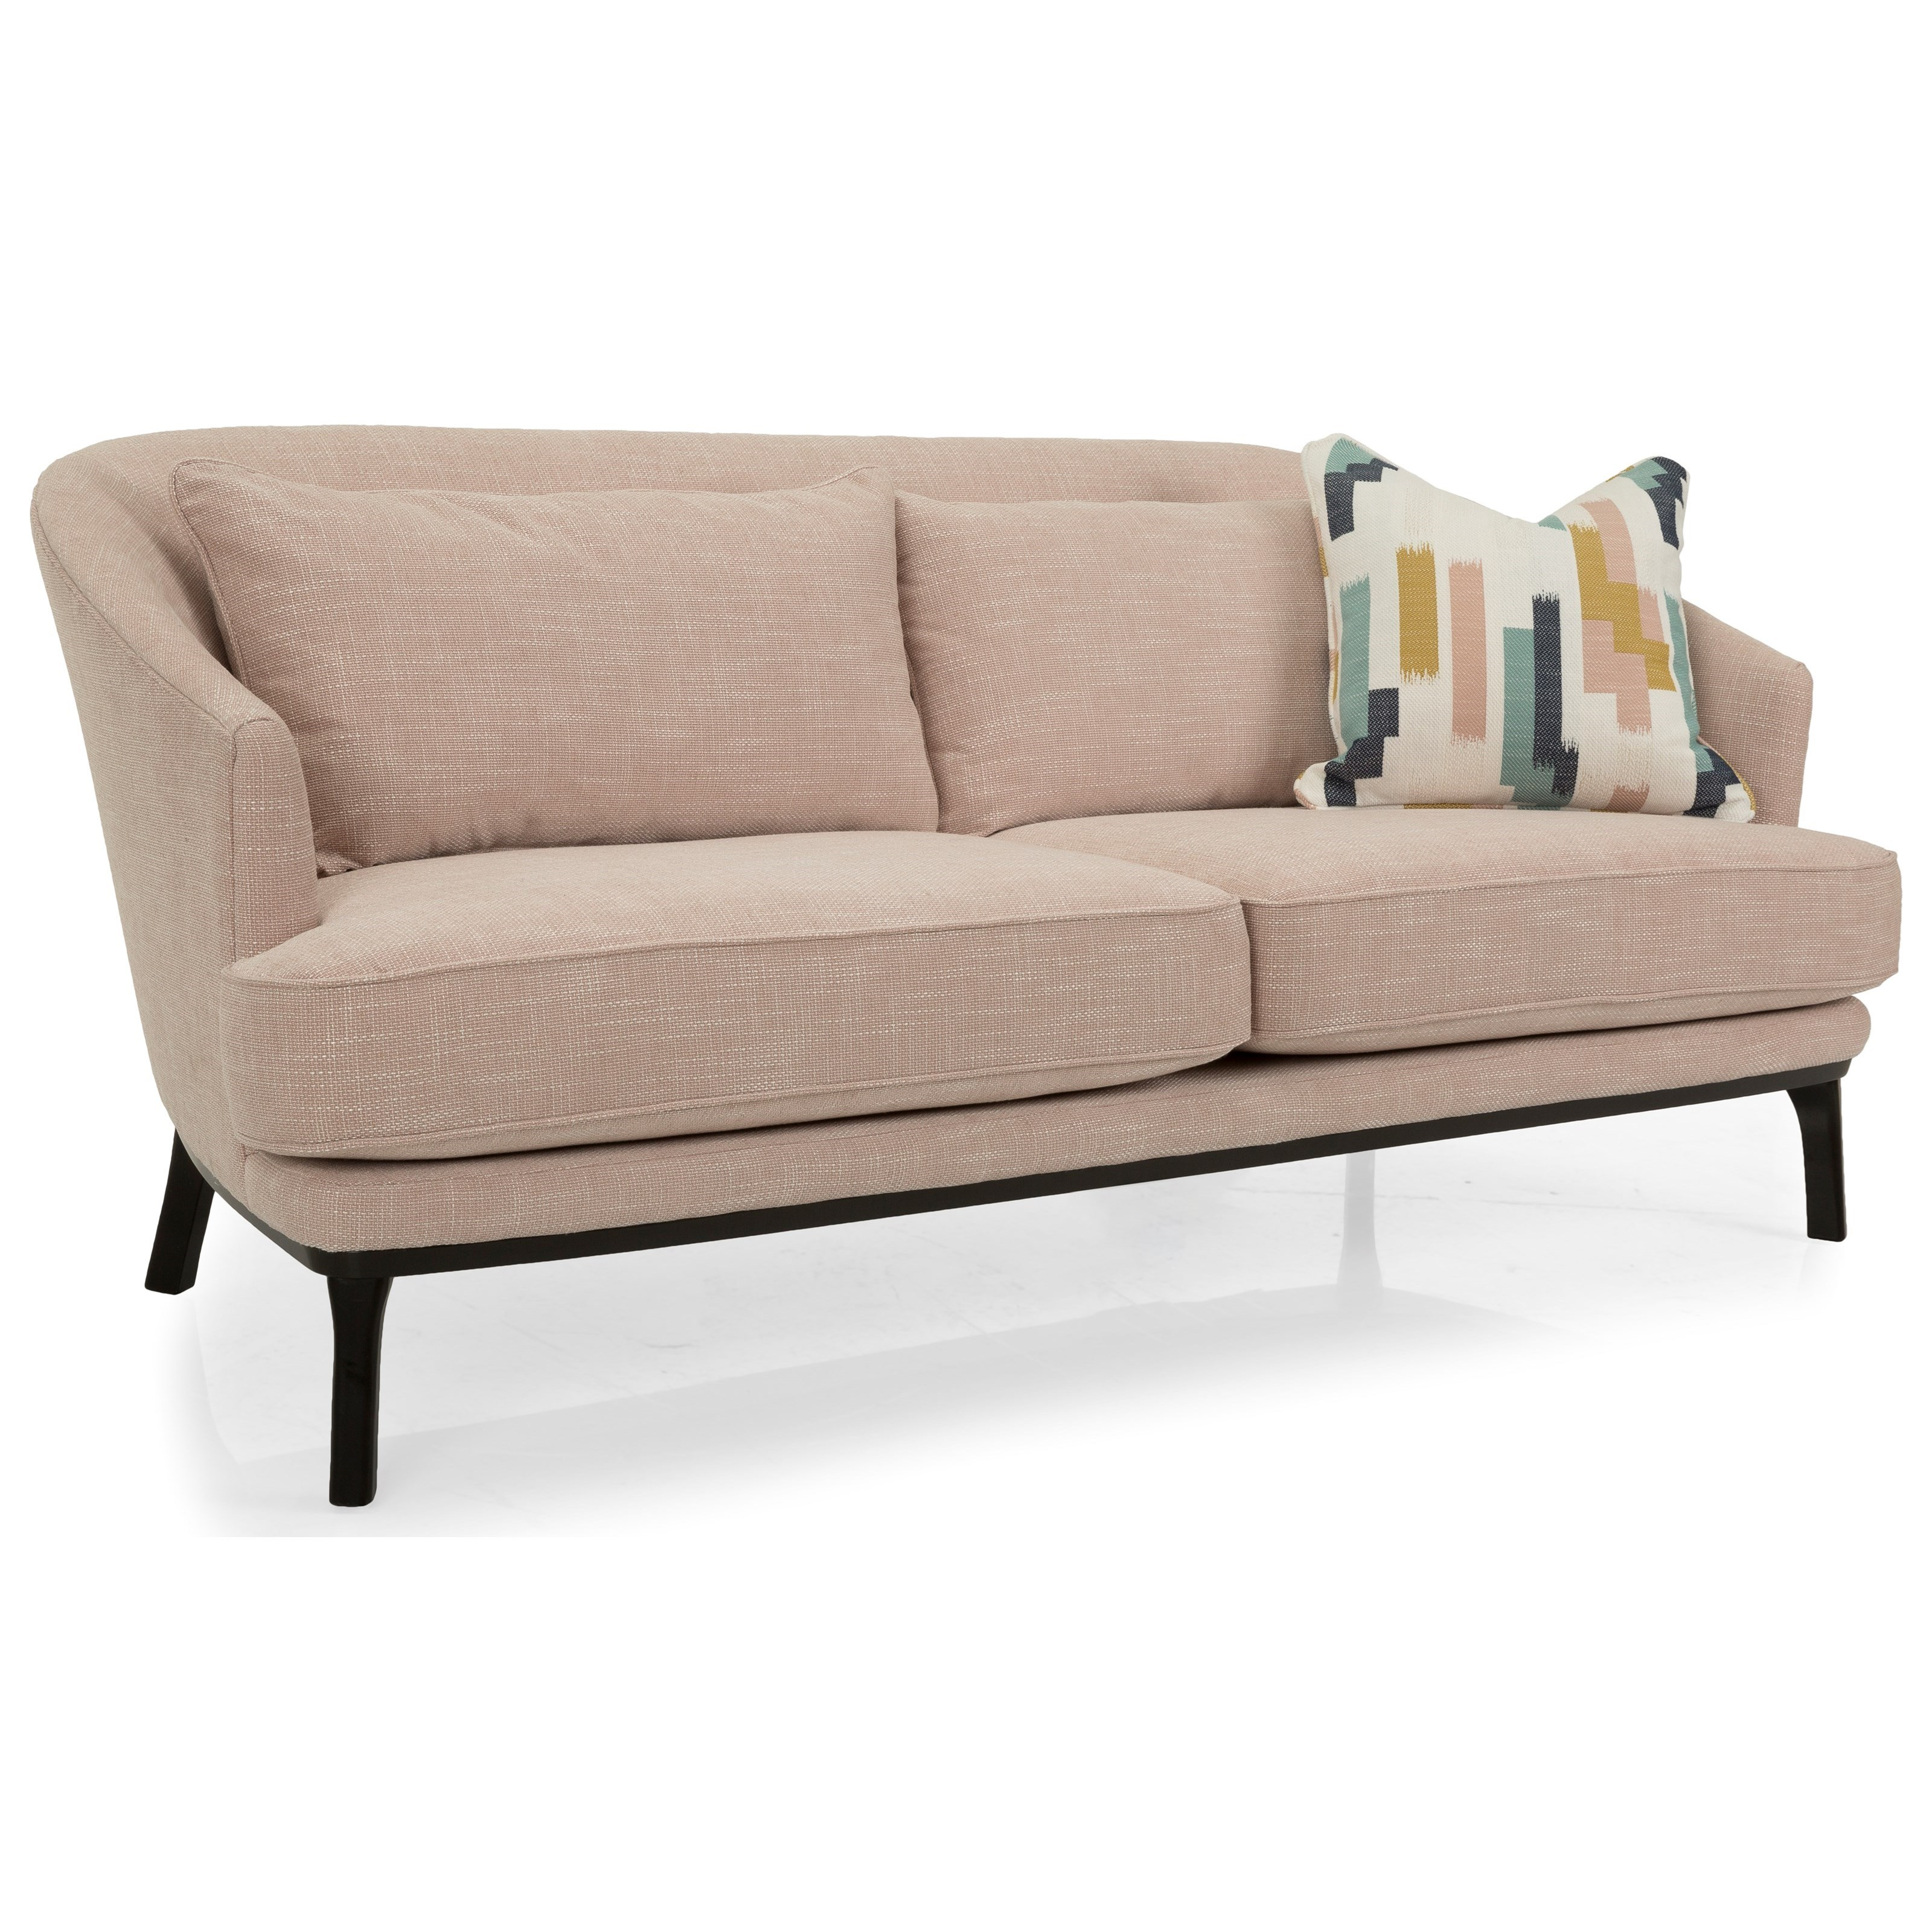 2883 Sofa by Decor-Rest at Johnny Janosik